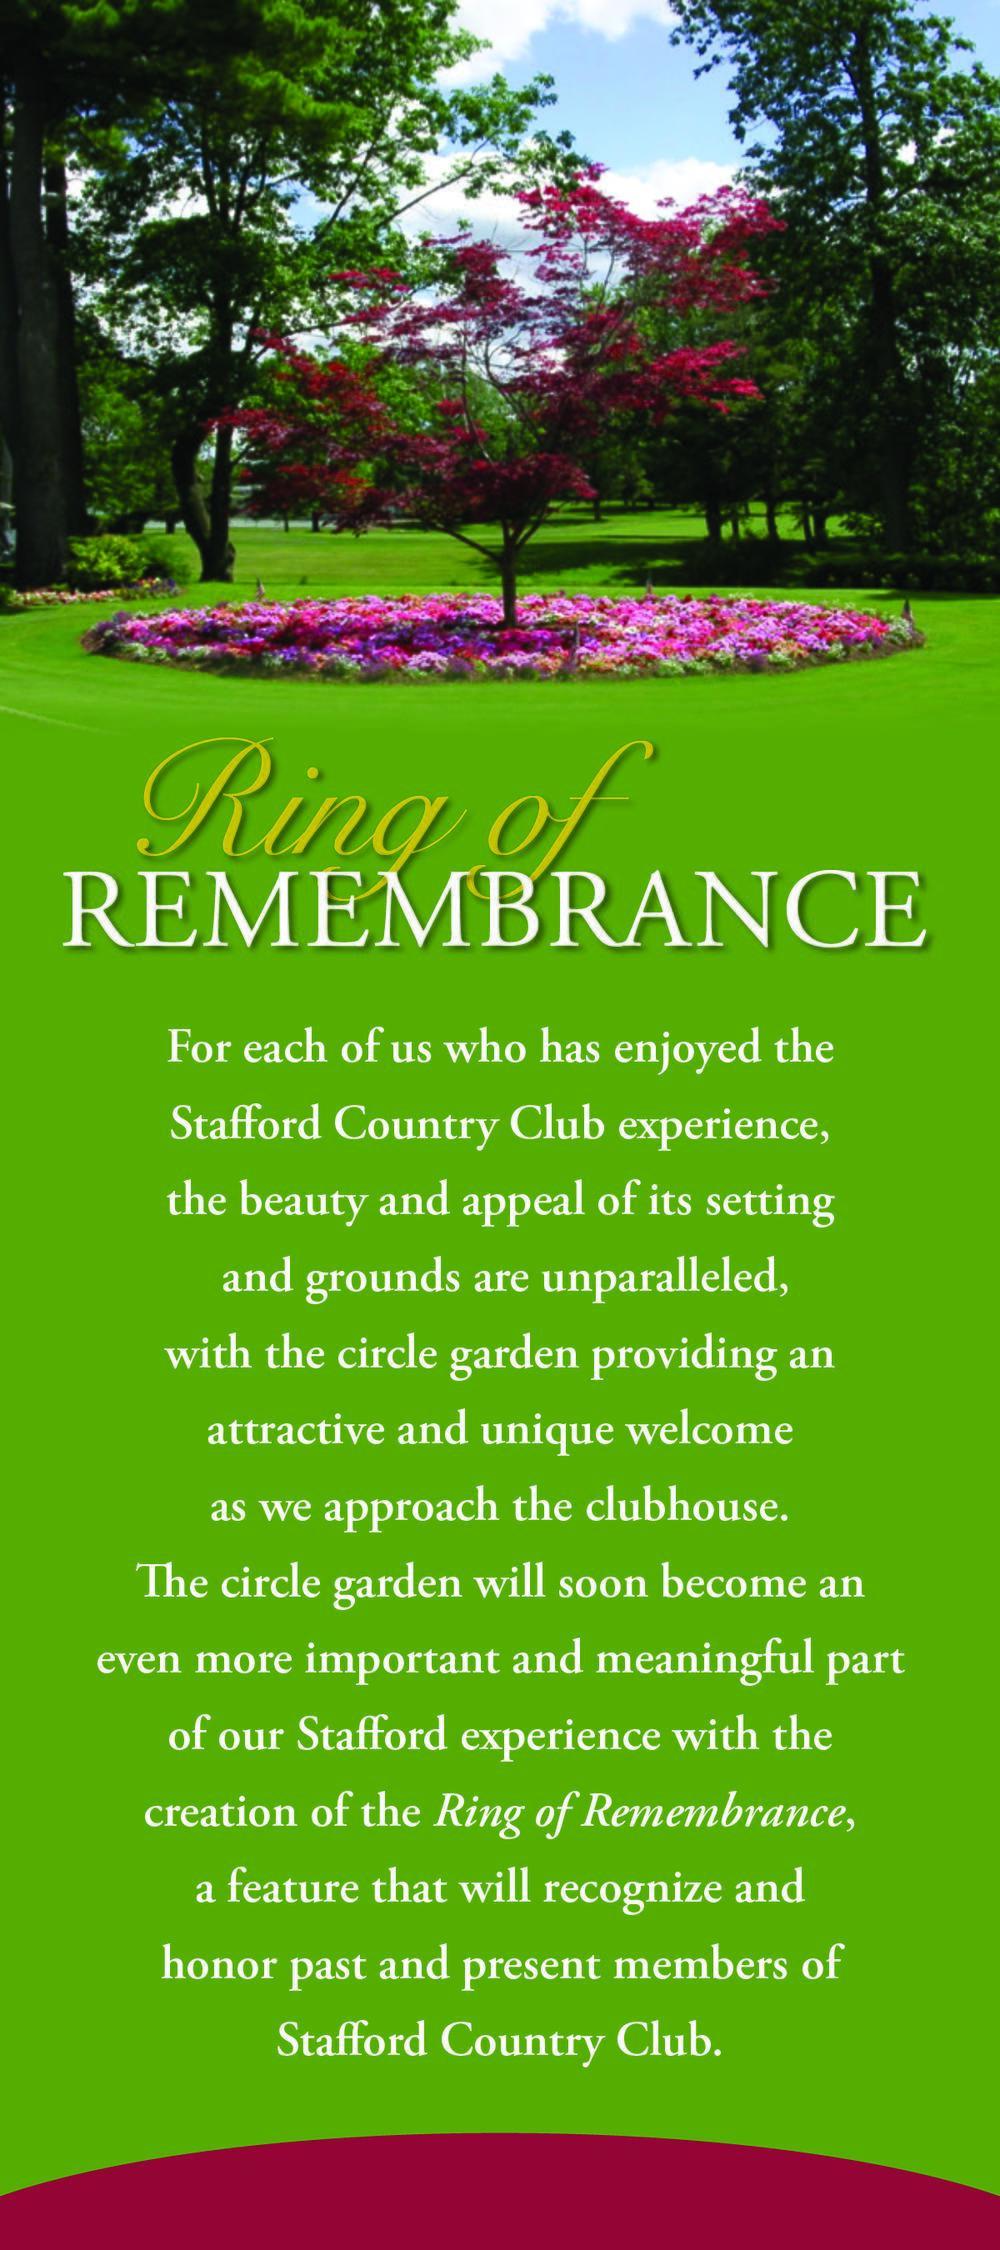 2015 Ring of Rememberance - Rackcard